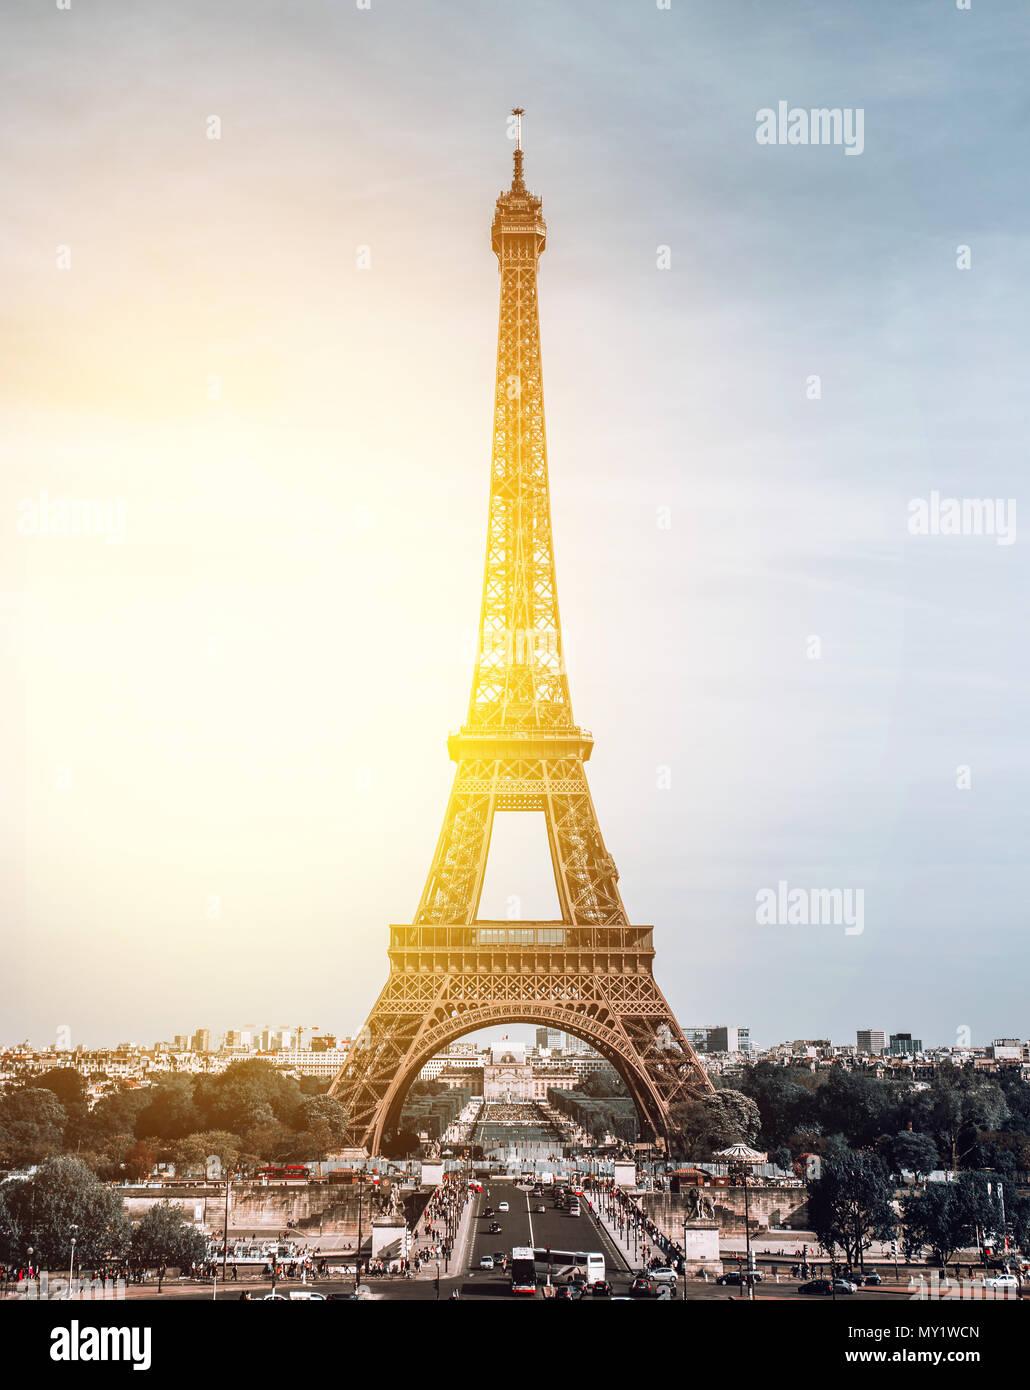 Vista verticale sulla Torre Eiffel, Paris, Francia. Immagini Stock